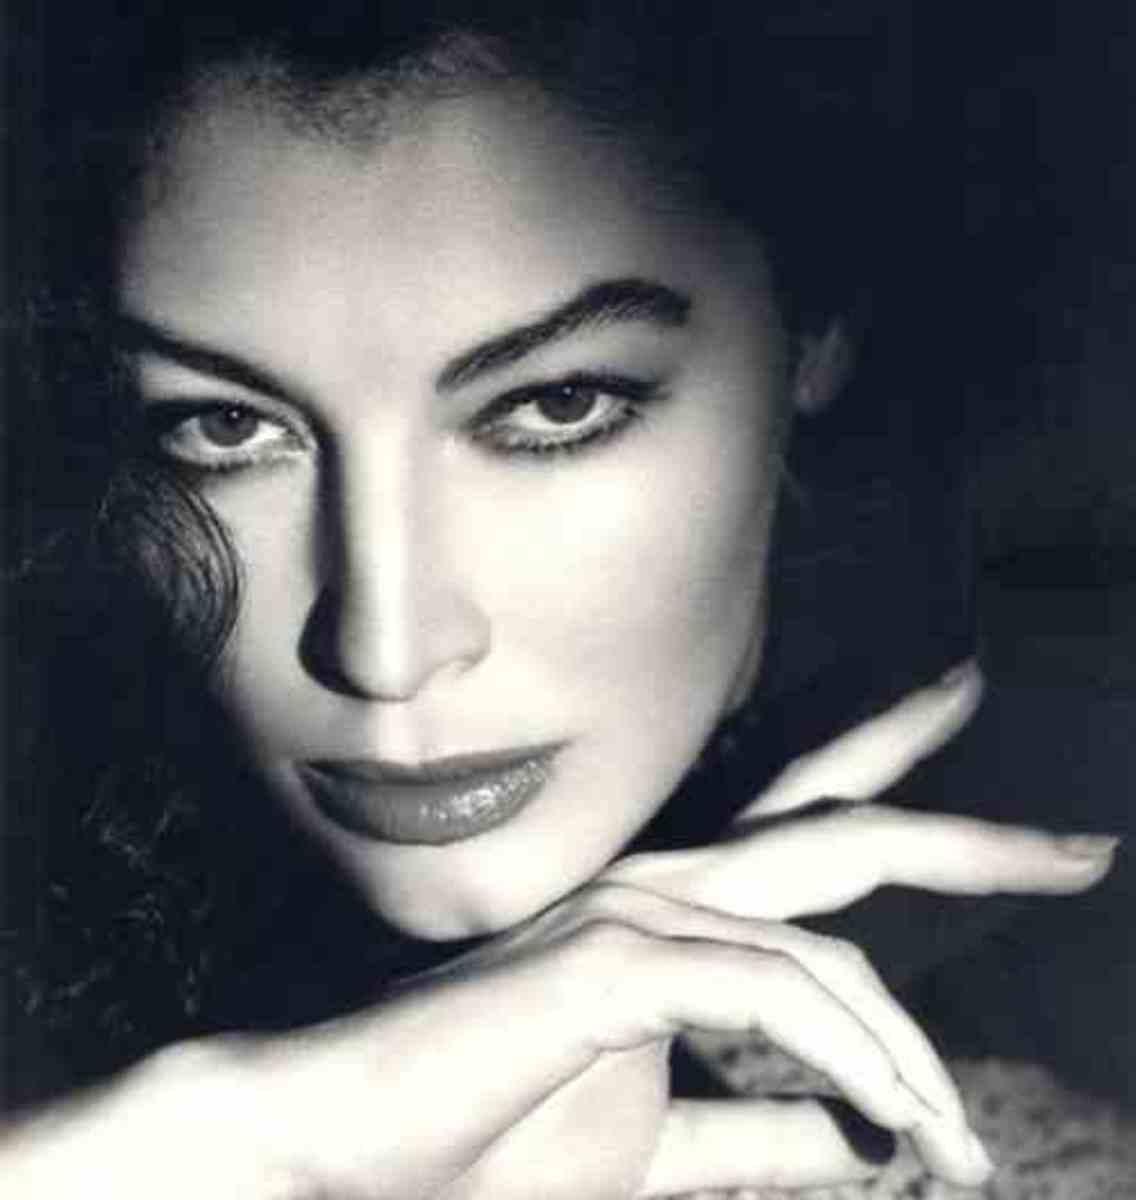 Ava Gardner the original Femme Fatale noirwhale.com